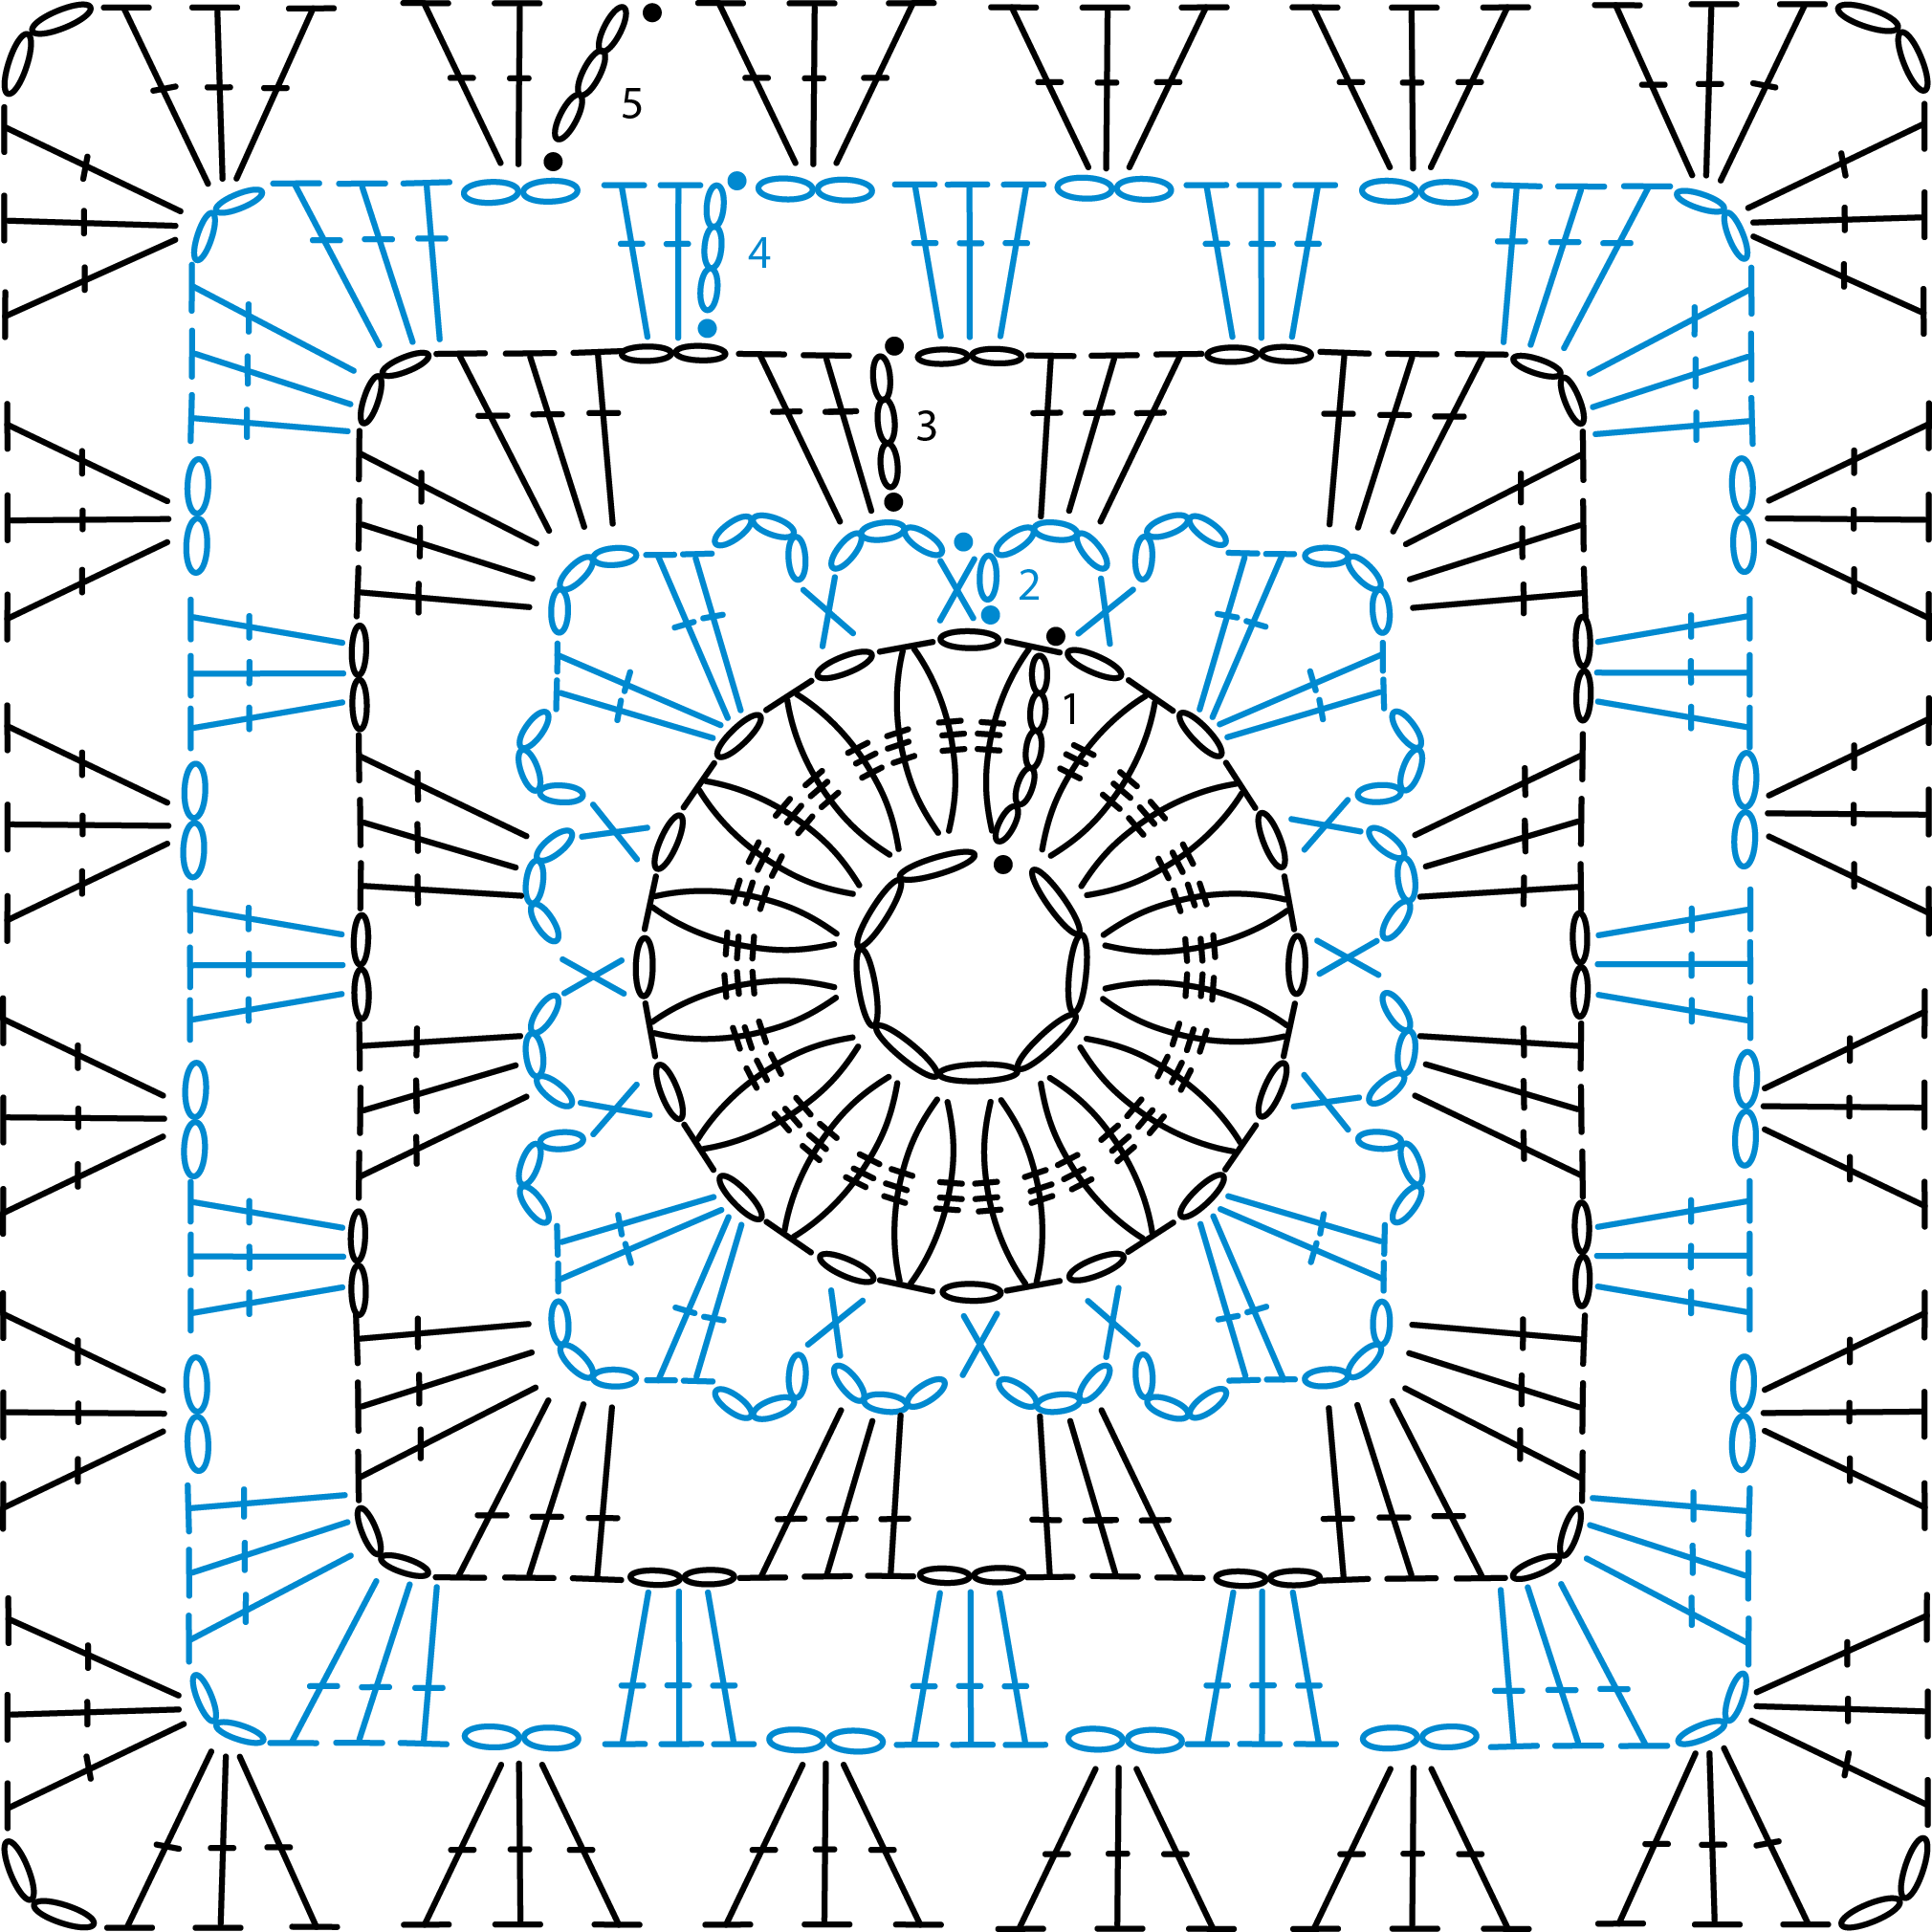 Pin de Kyung Visser en crochet/knit | Pinterest | Ganchillo ...